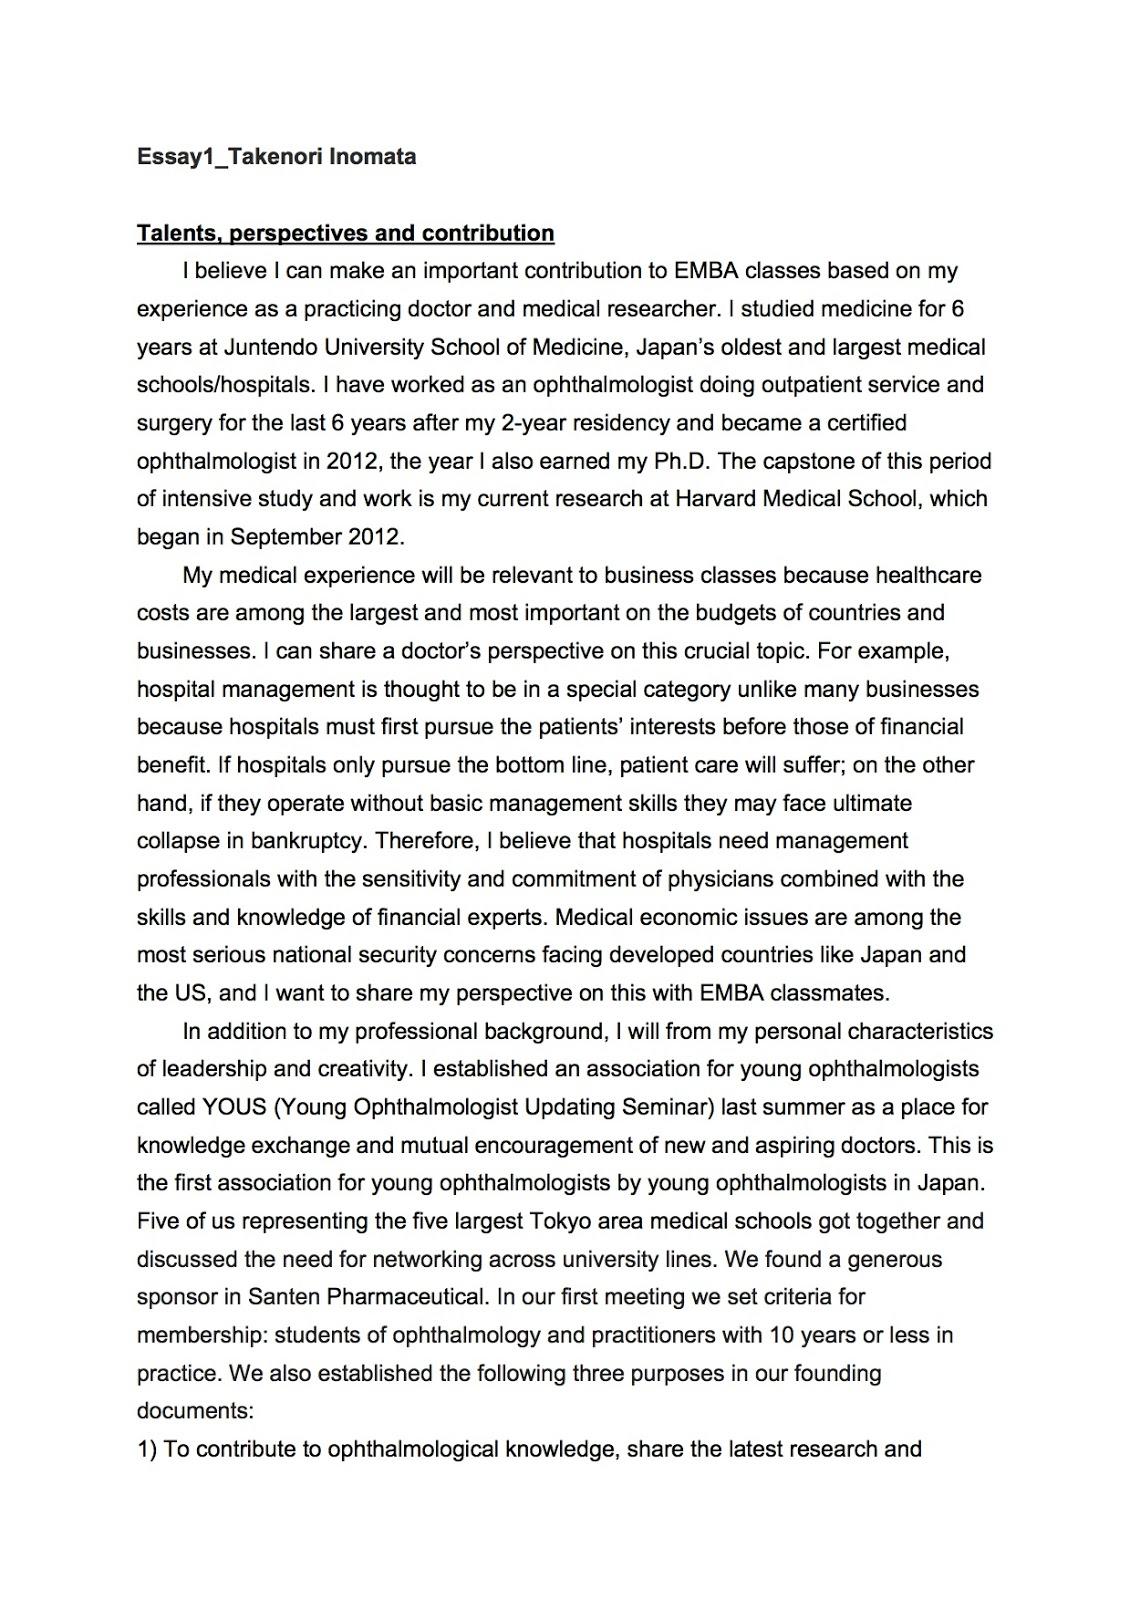 University essay for mba